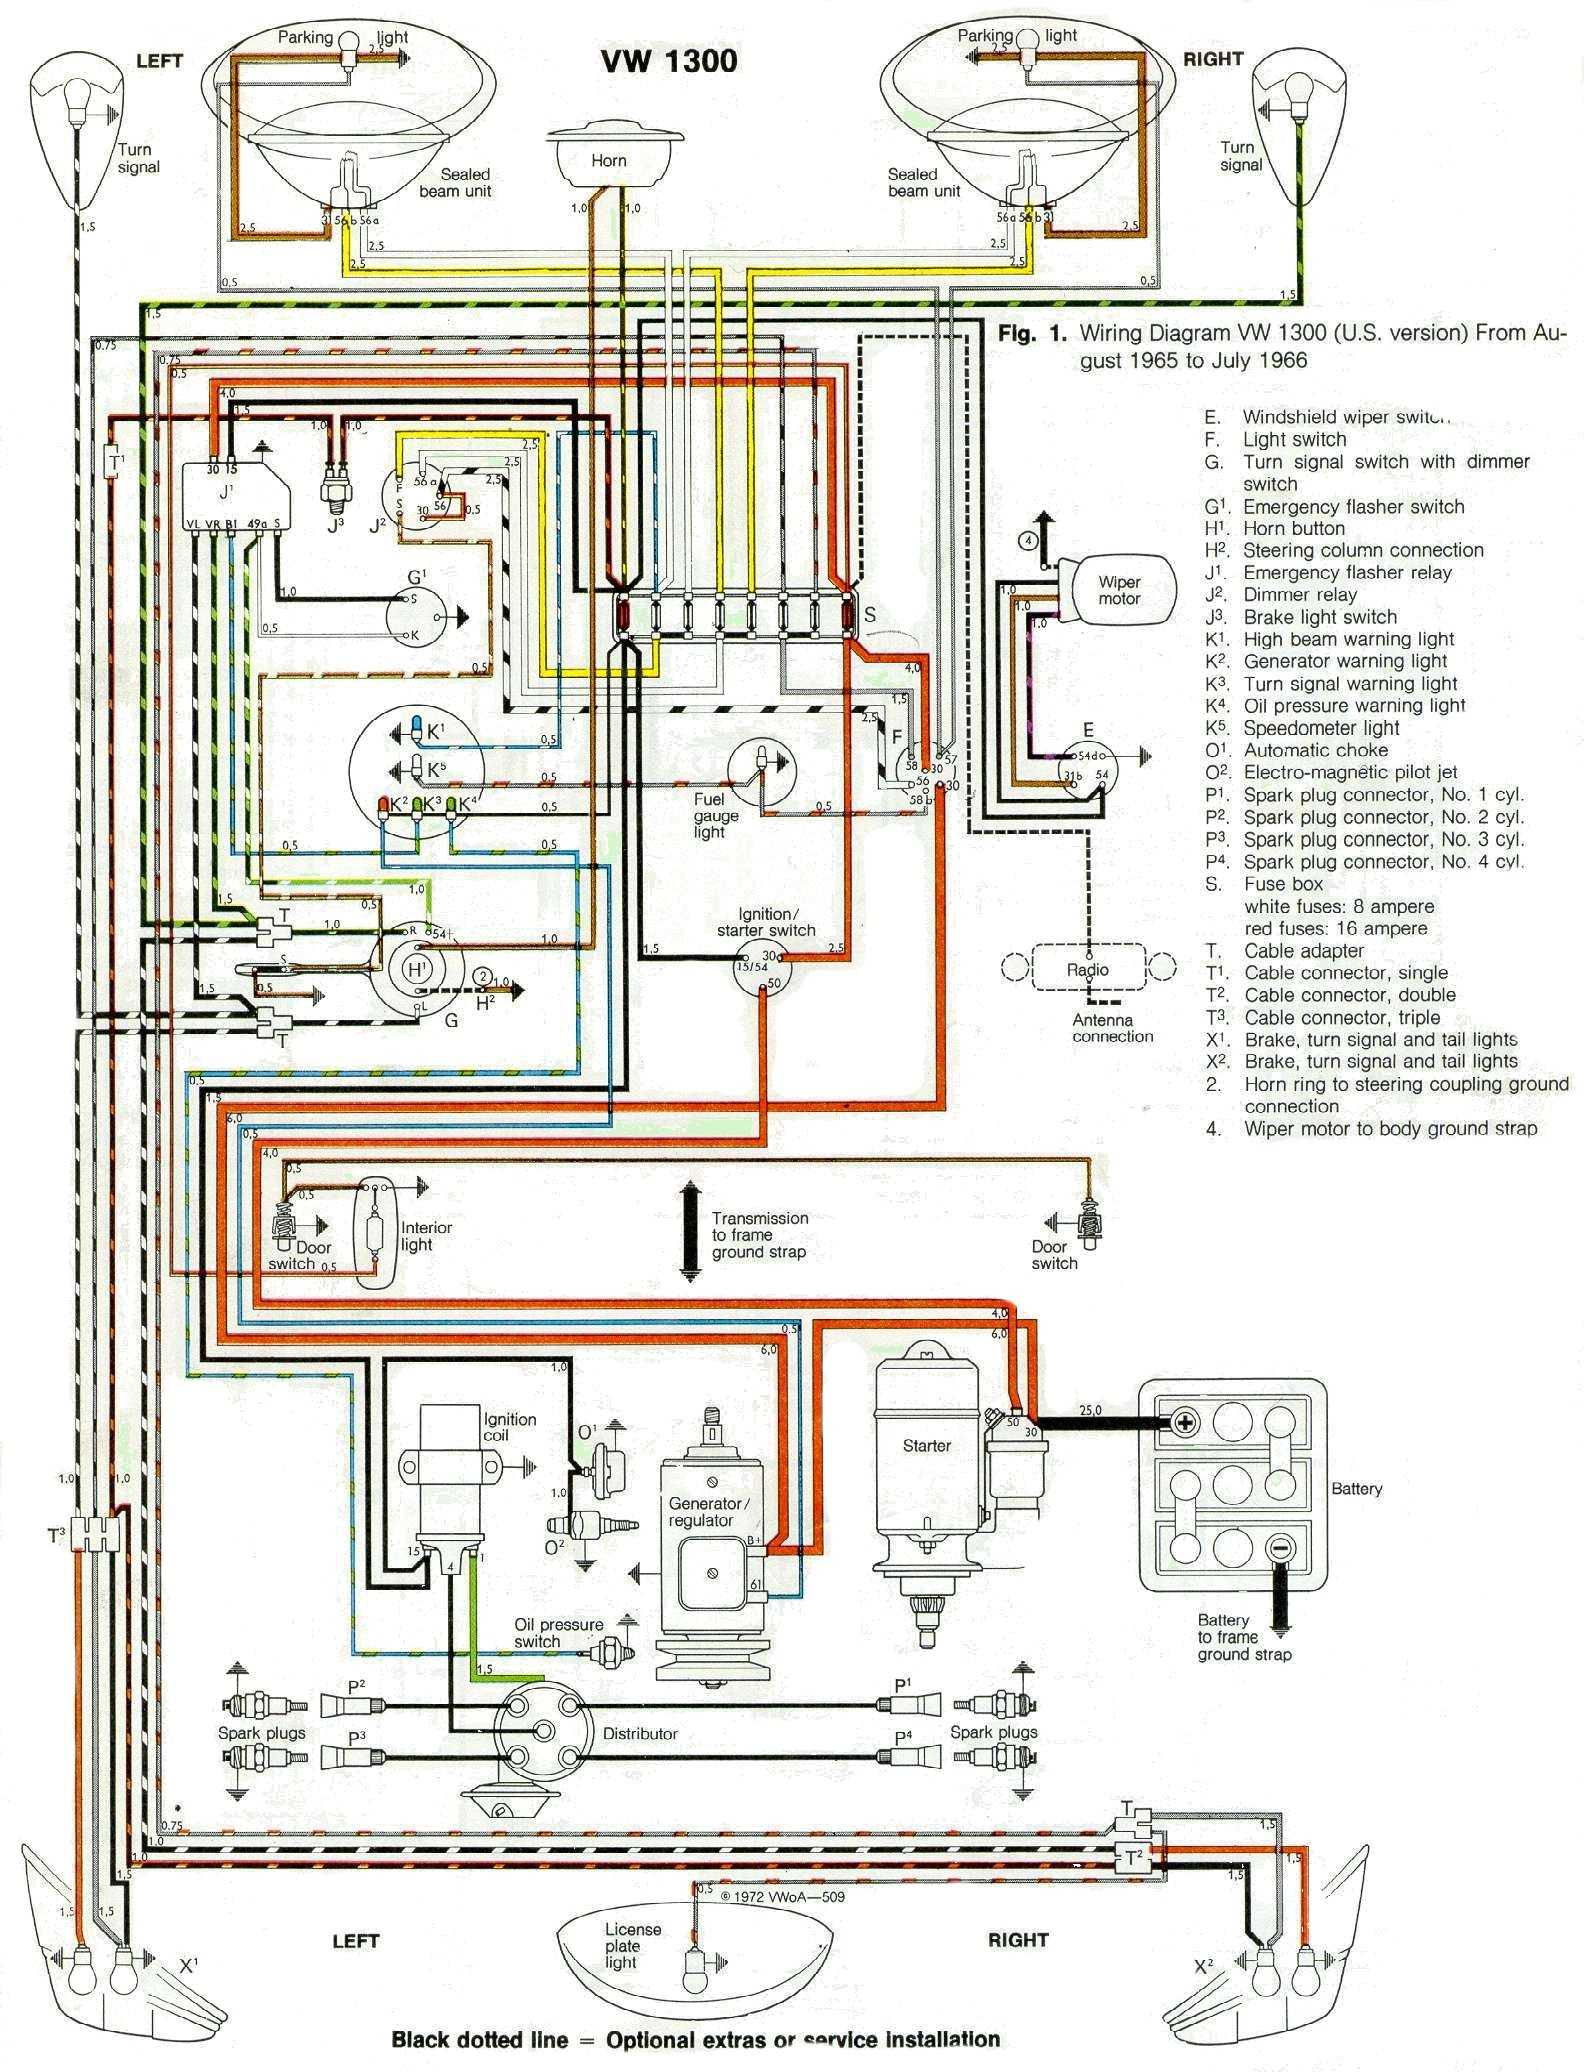 vw beetle starter wiring diagram wiring diagram image rh mainetreasurechest com 1974 vw beetle starter wiring diagram 1971 vw beetle starter wiring diagram